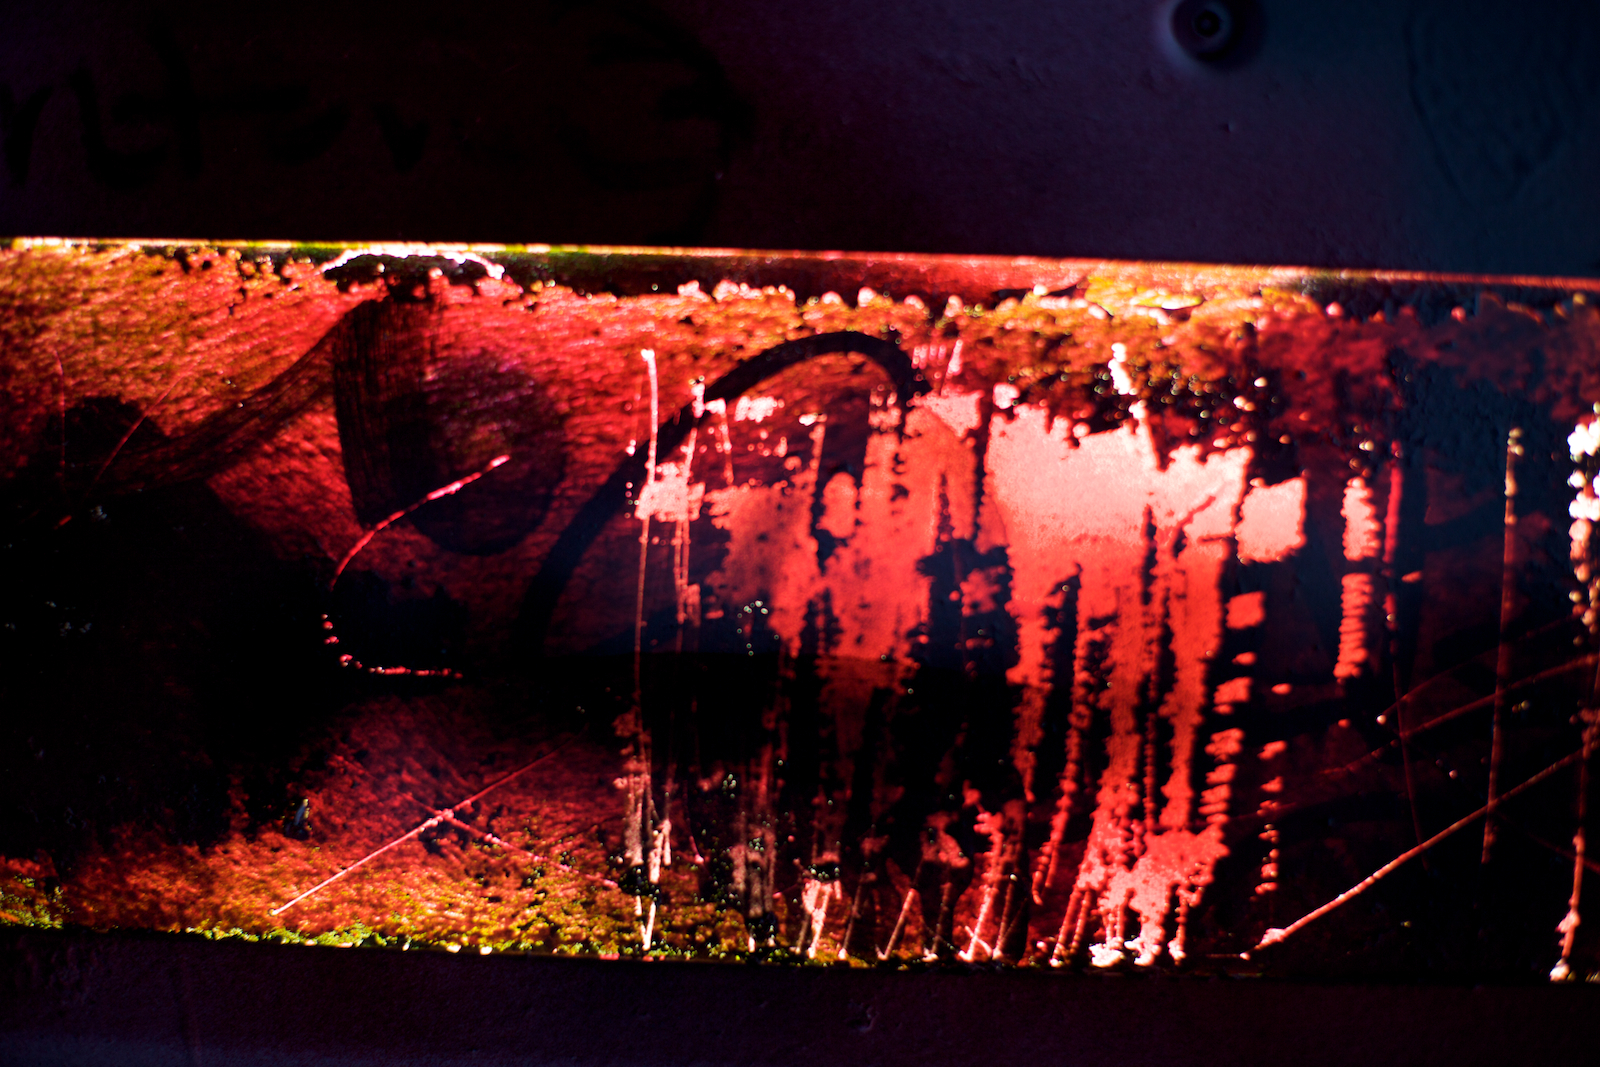 ncsu-expression-015.jpg